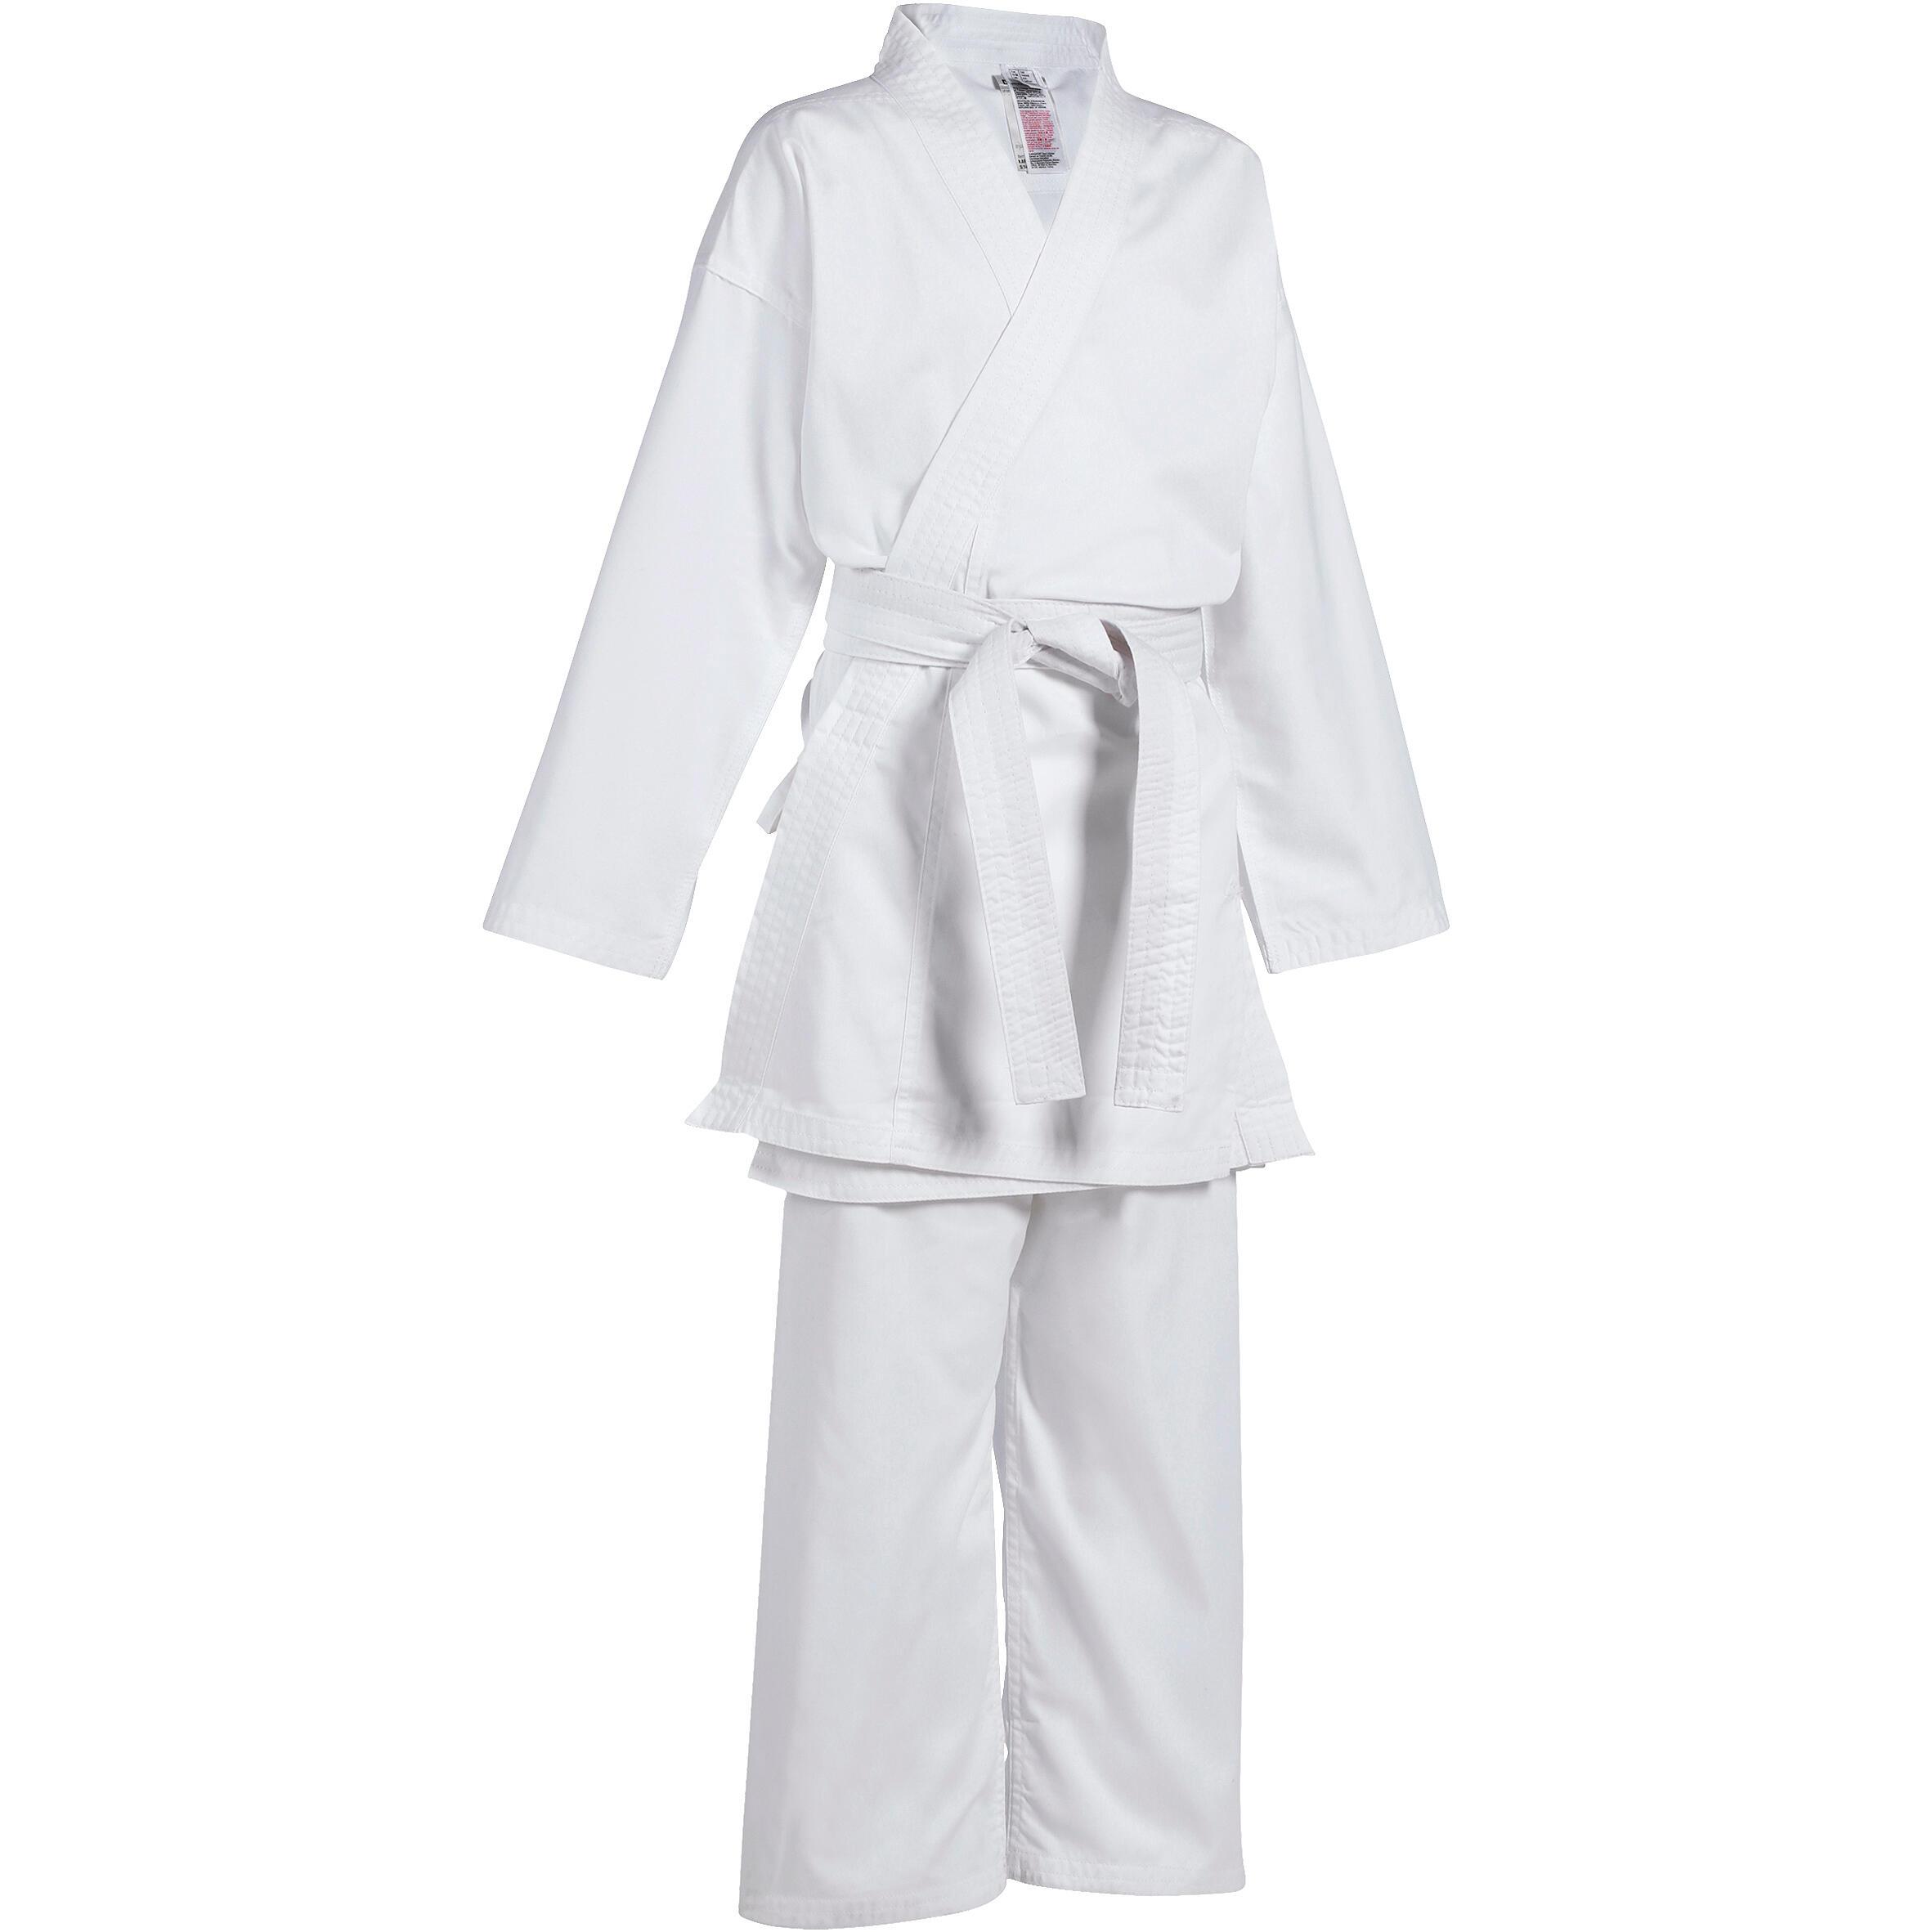 200 Kids' Beginners' Karate Gi